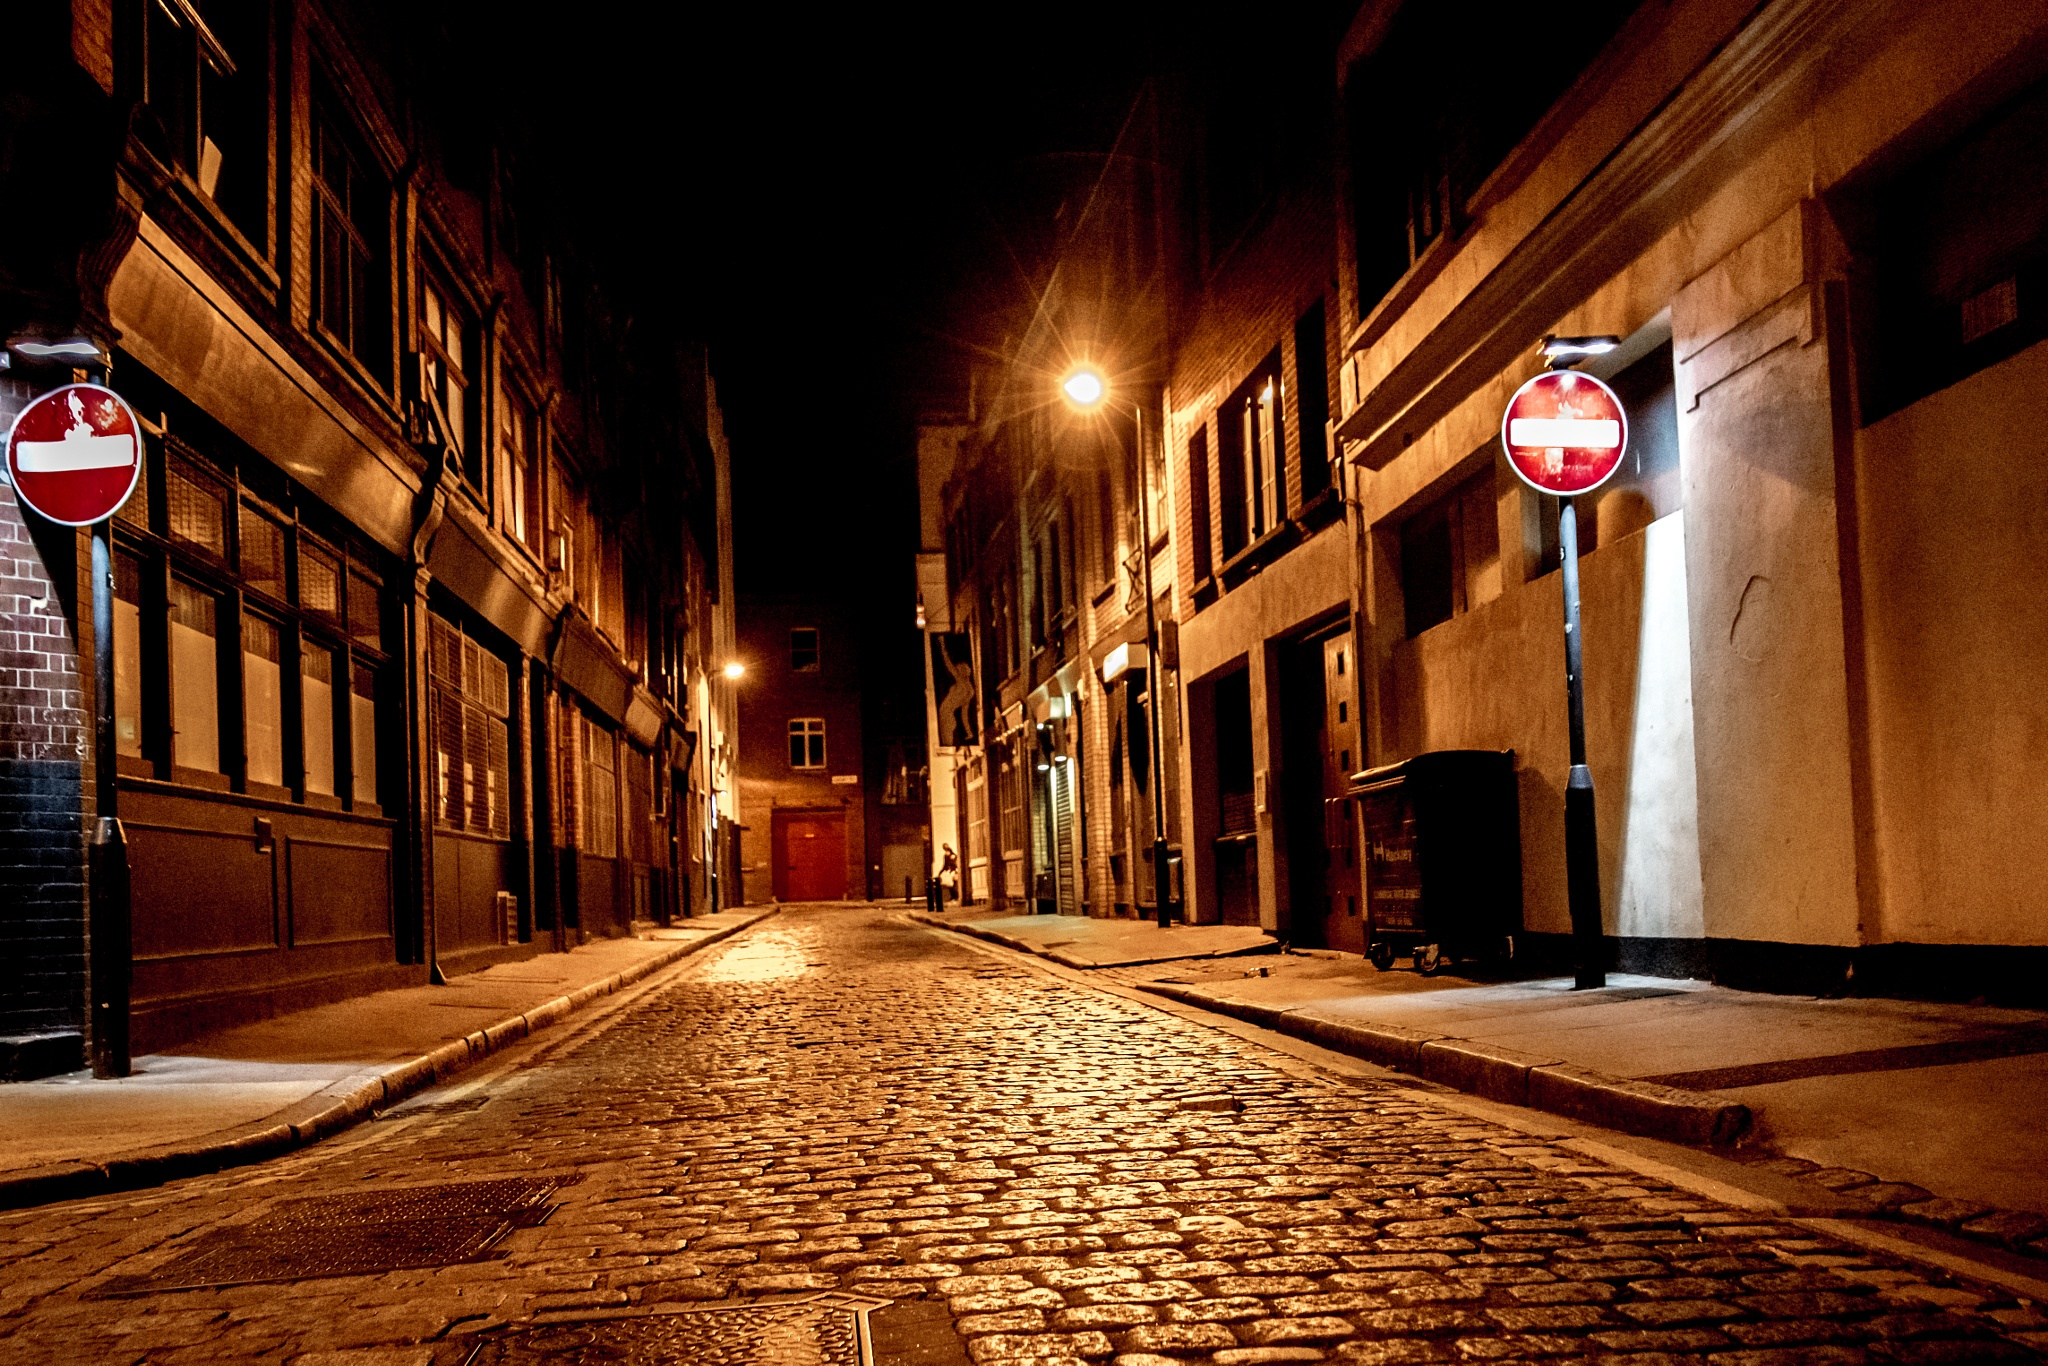 London street by Rotea Marian